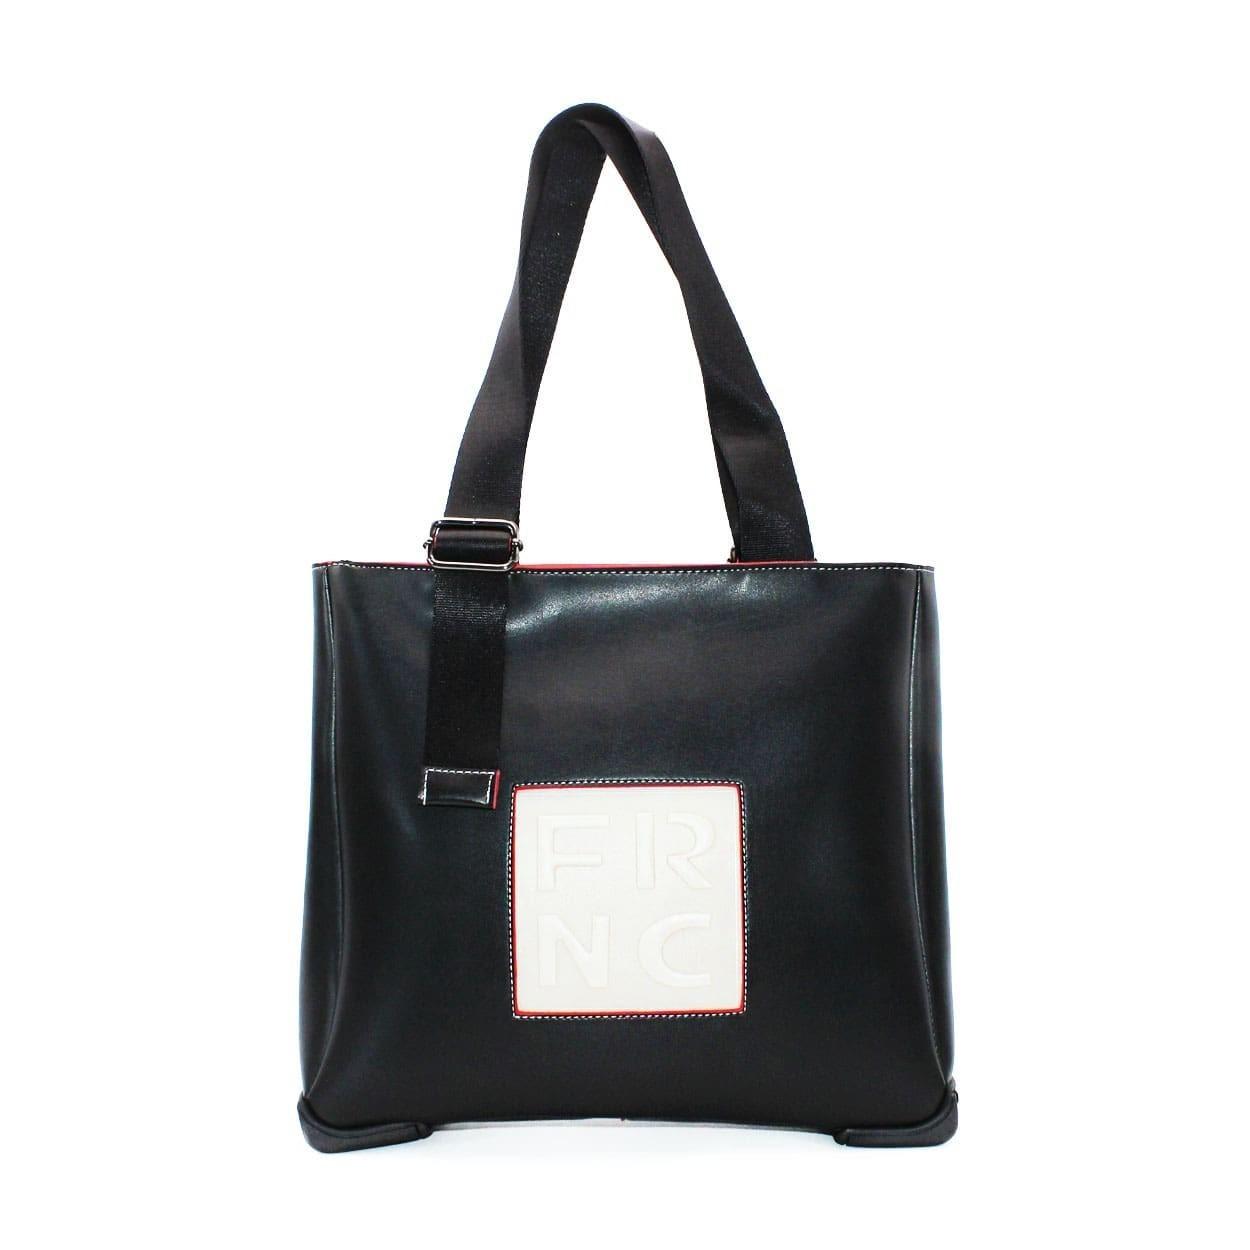 FRNC FRANCESCO Τσάντα Γυναικεία Ώμου 2020 Μαύρο Δέρμα  0dfa0049518